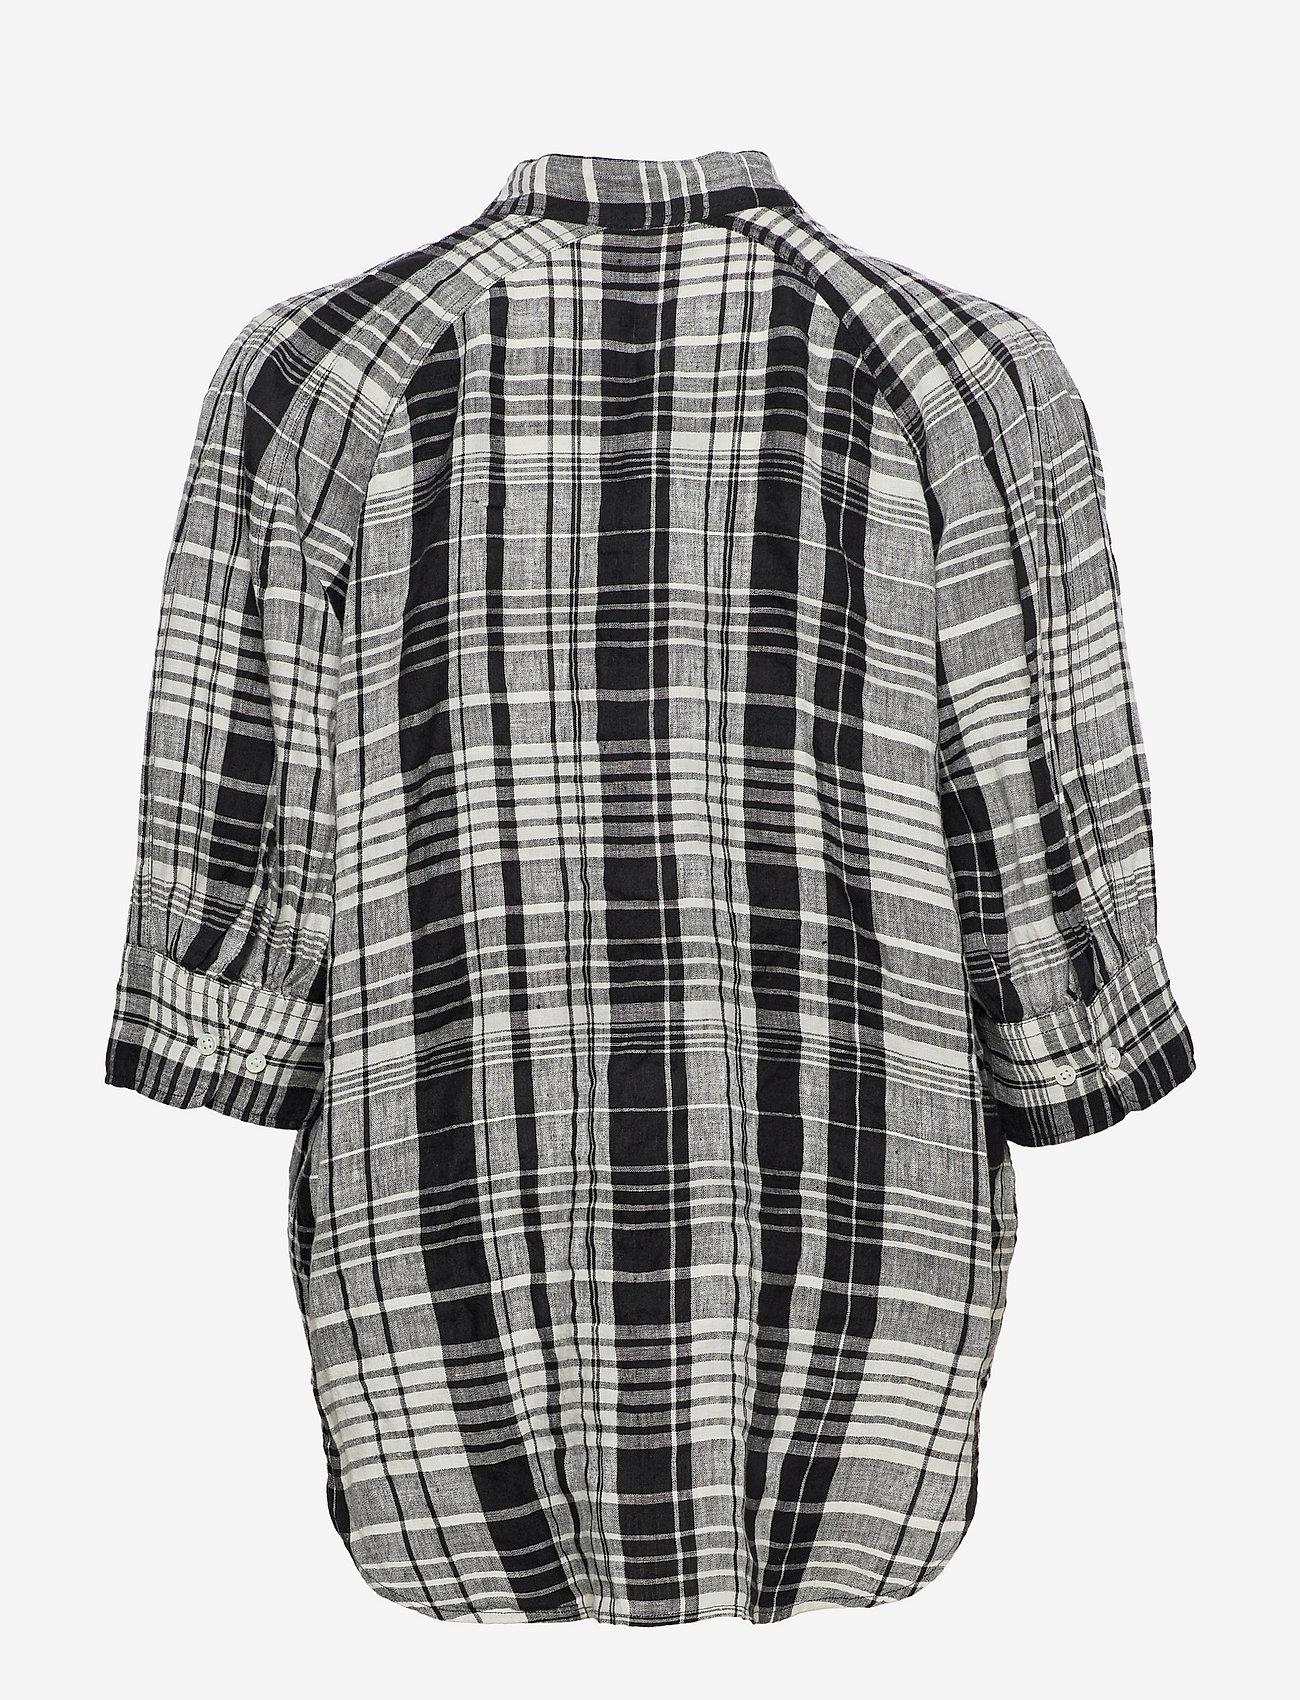 Polo Ralph Lauren - SS CICI ST-ELBOW SLEEVE-SHIRT - long-sleeved shirts - 1088 polo black/ - 1